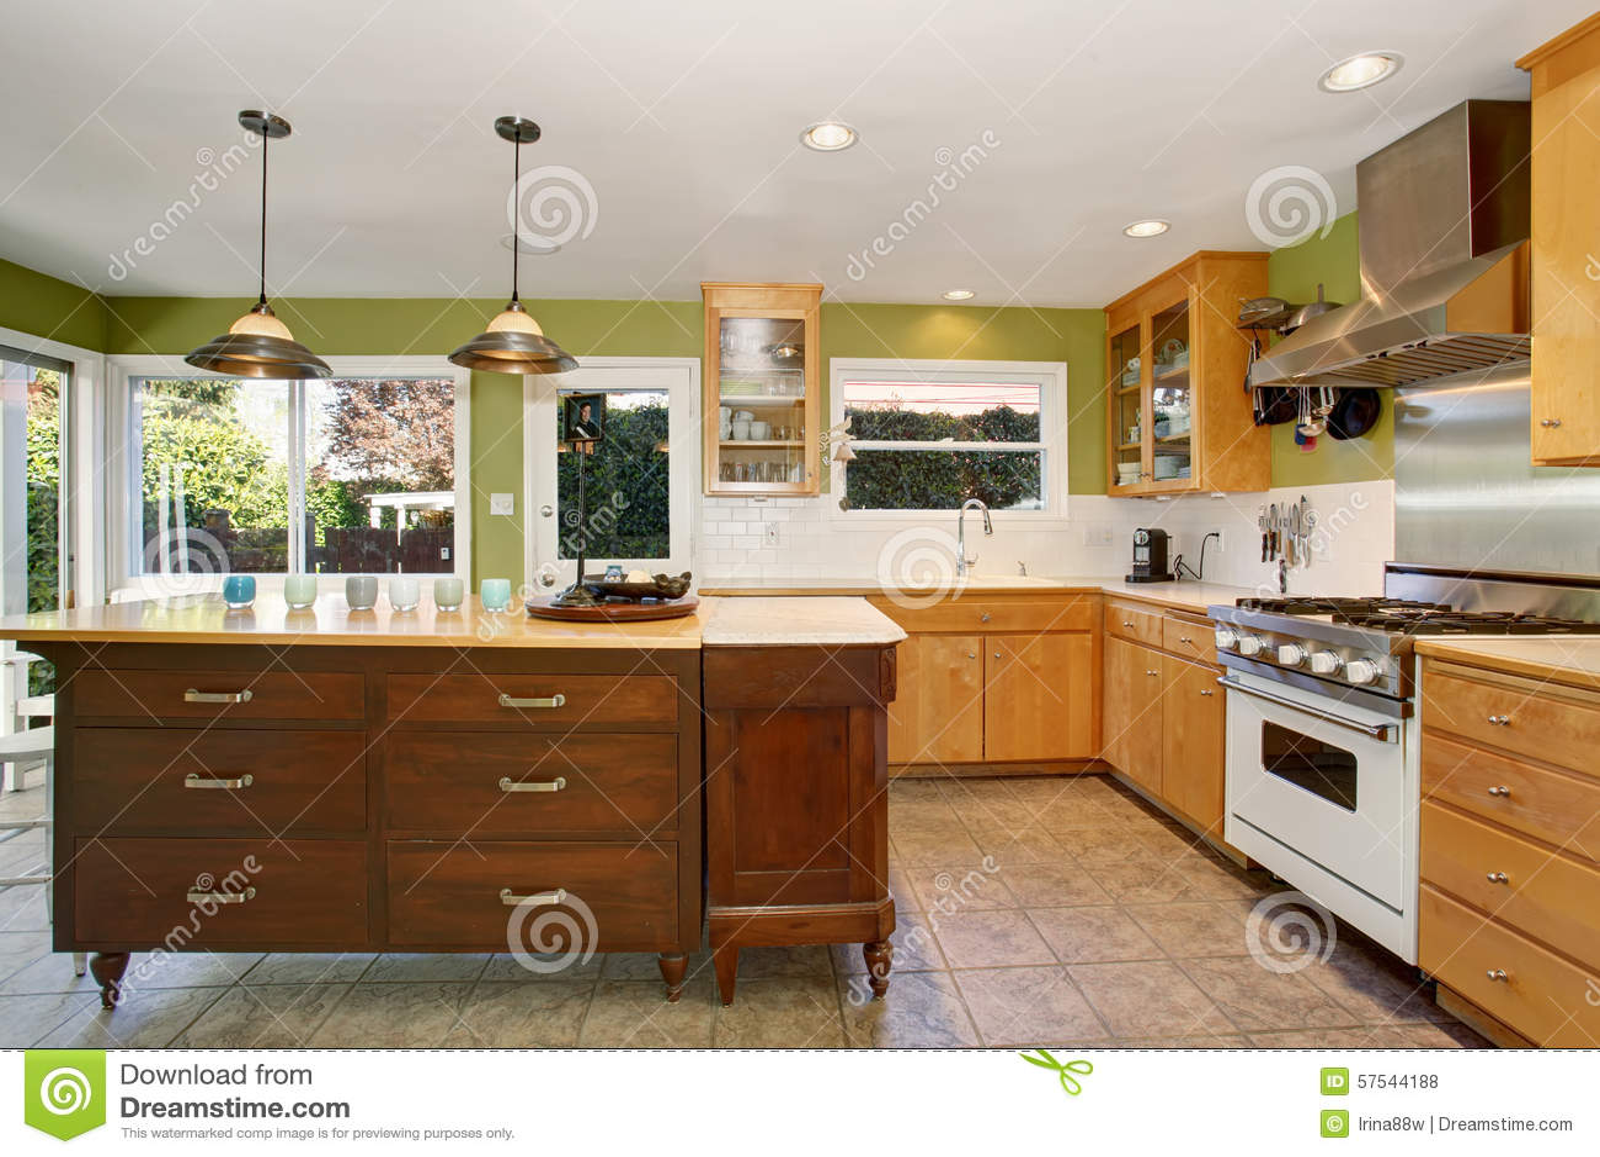 Parete Cucina Idee : Idee per parete cucina. Idee per decorare ...